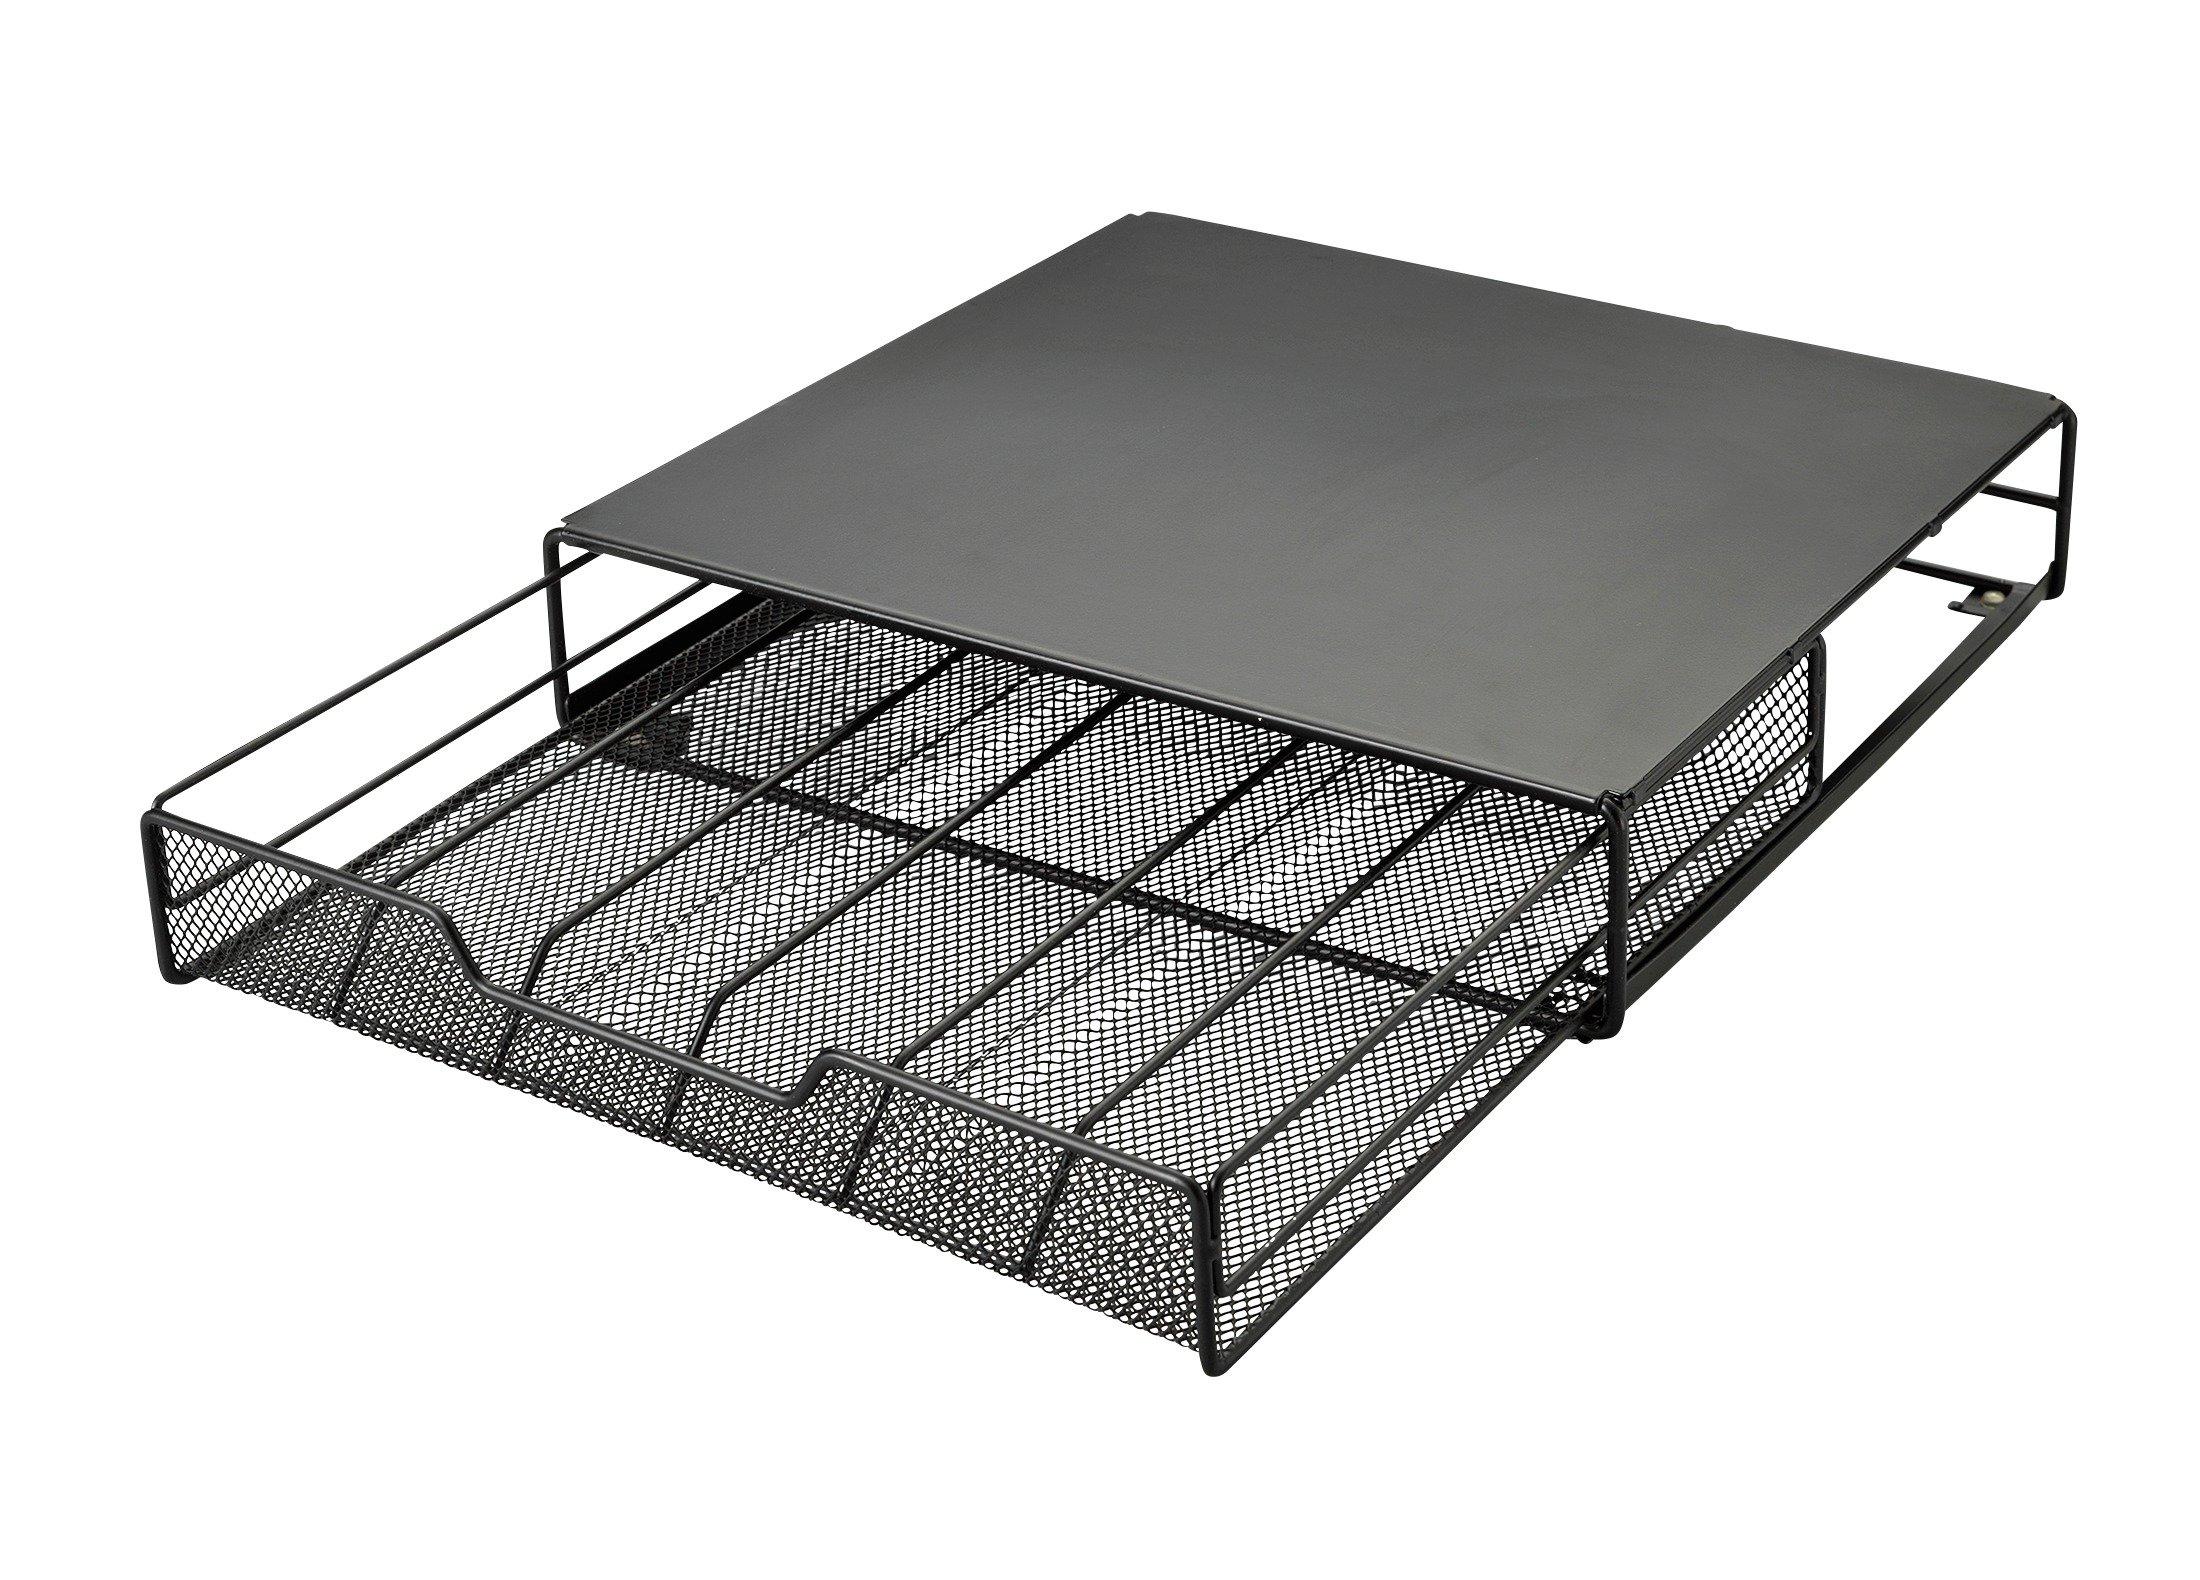 home-coffee-pod-storage-holder